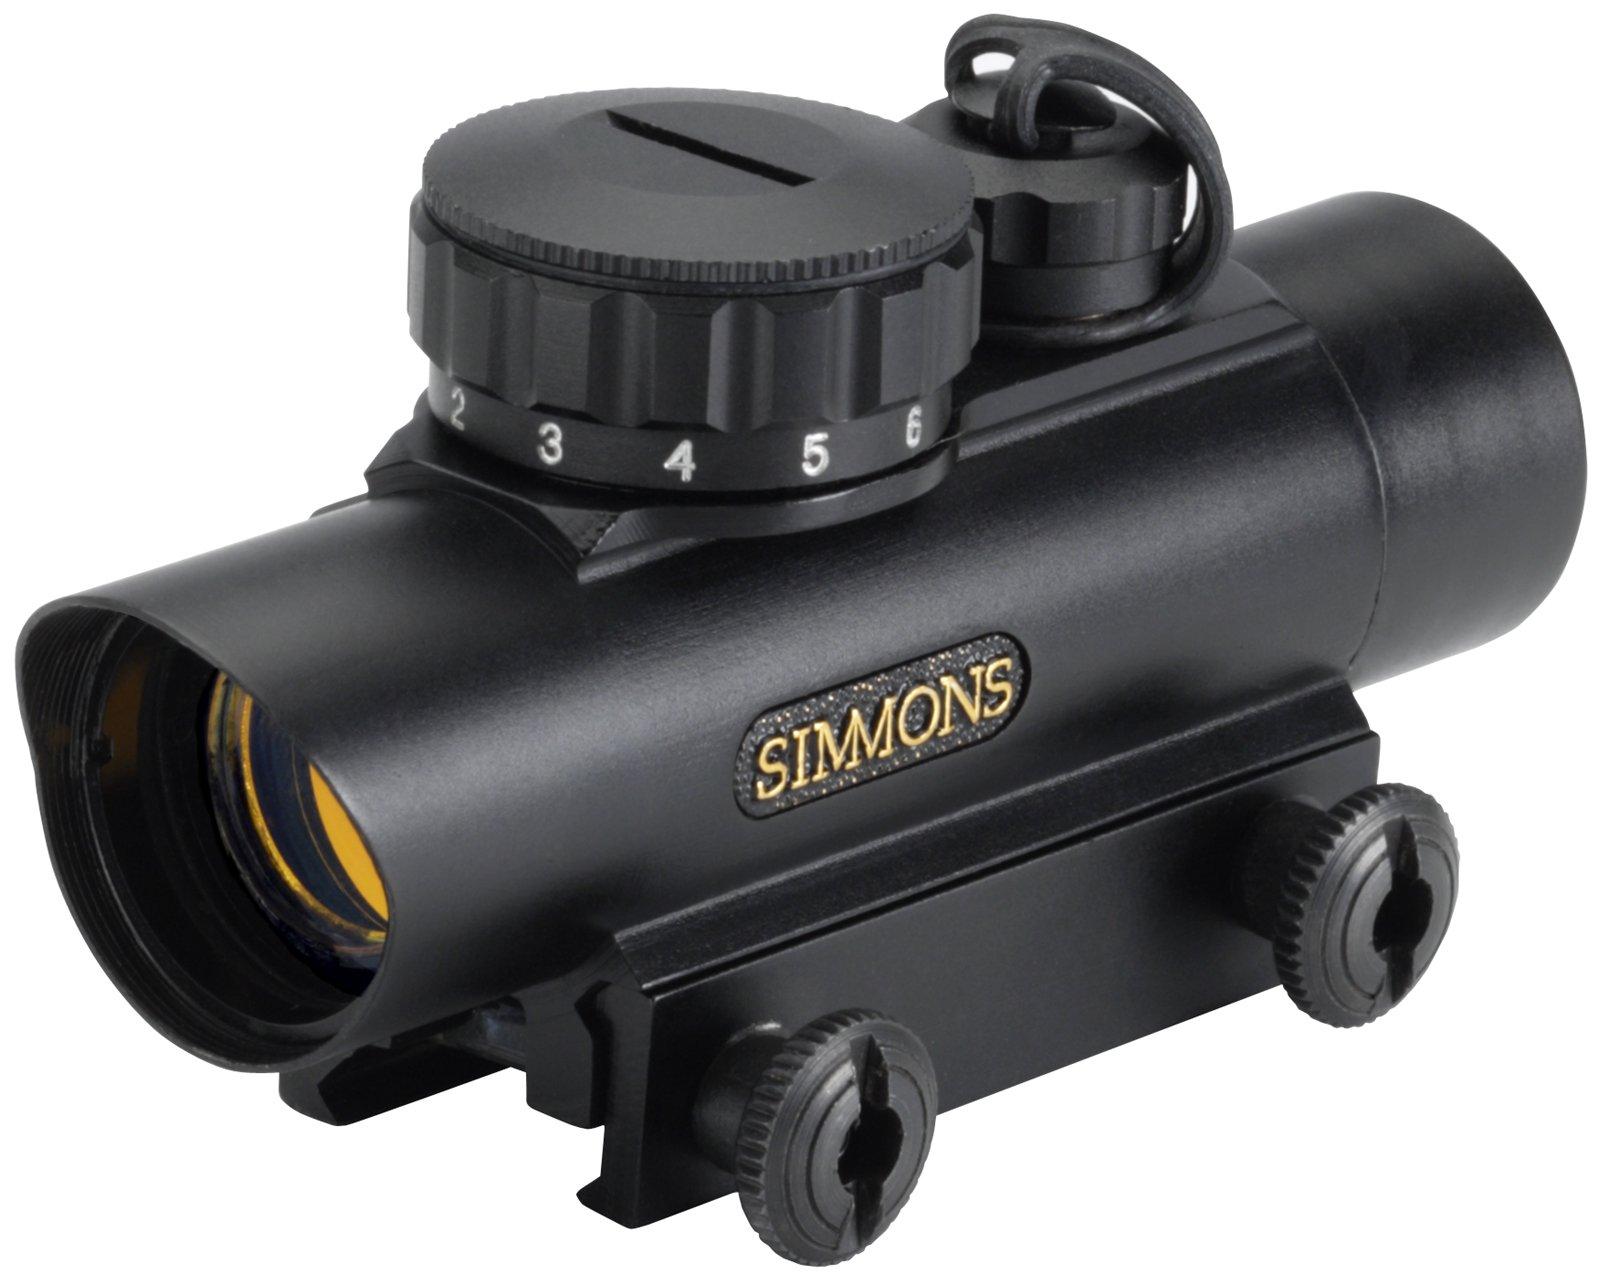 Simmons RedDot 1 x 20mm 5-MOA Dot, Red Illuminated Scope